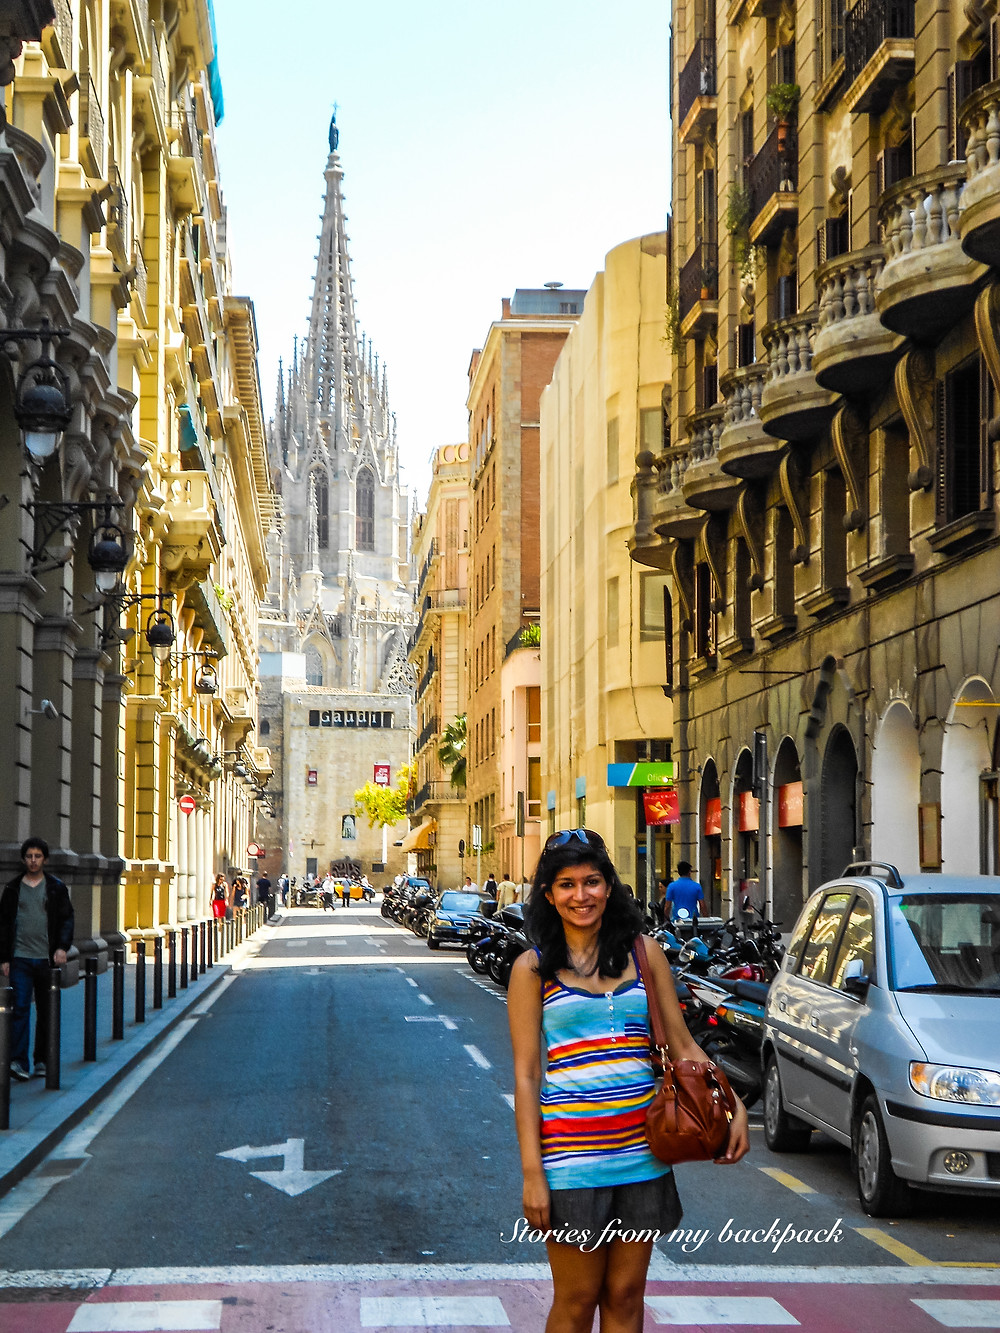 Gothic quarter in Barcelona, Barcelona historic area, Old Jewish Quarter in Barcelona, Picasso childhood in Barcelona, restaurants in gothic quarter